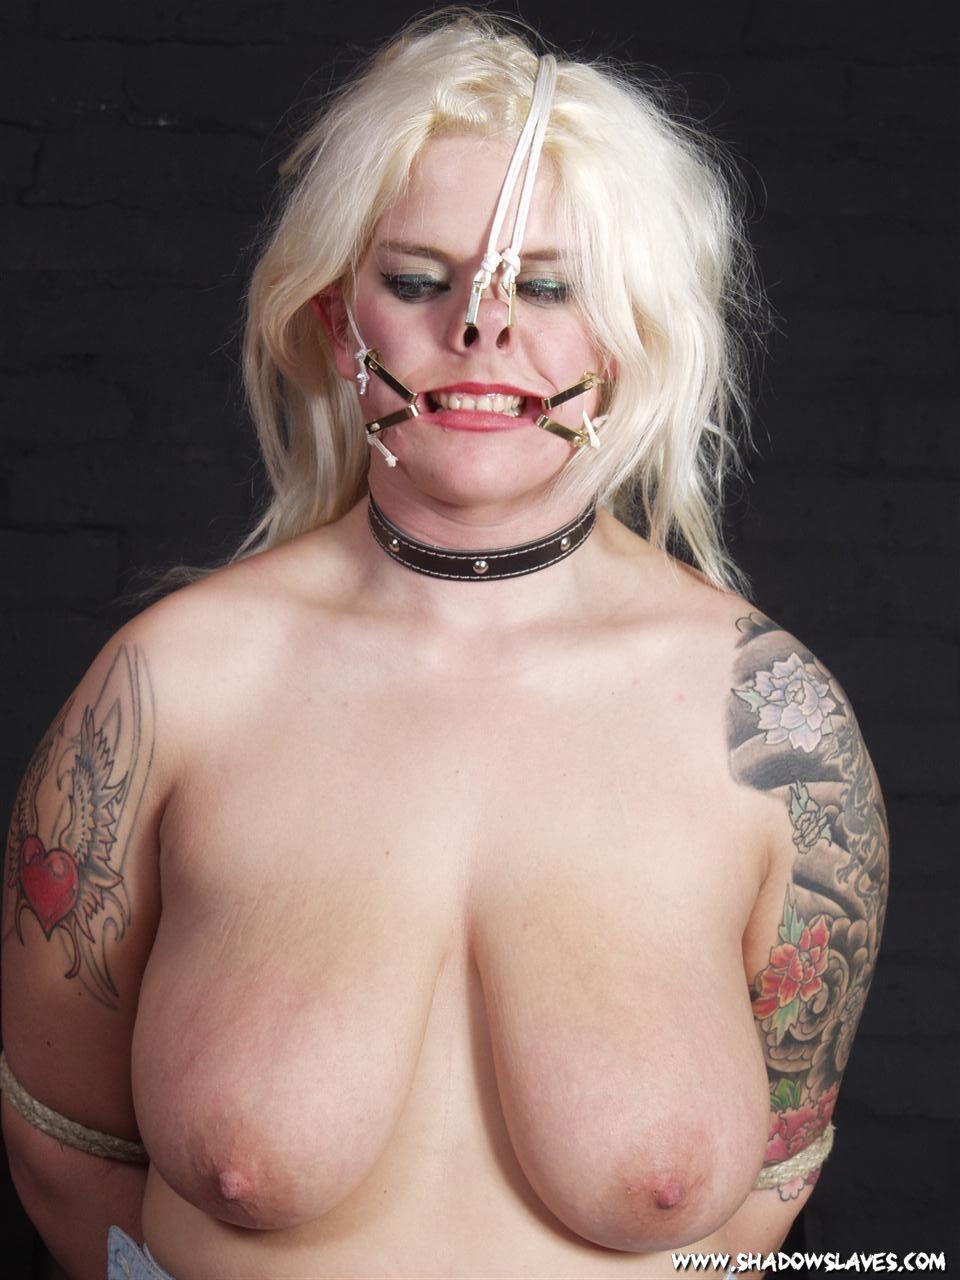 14 Beatrice Trezeguet topless in Miami Beach on 06/05/11 » Beatrice Trezeguet ...